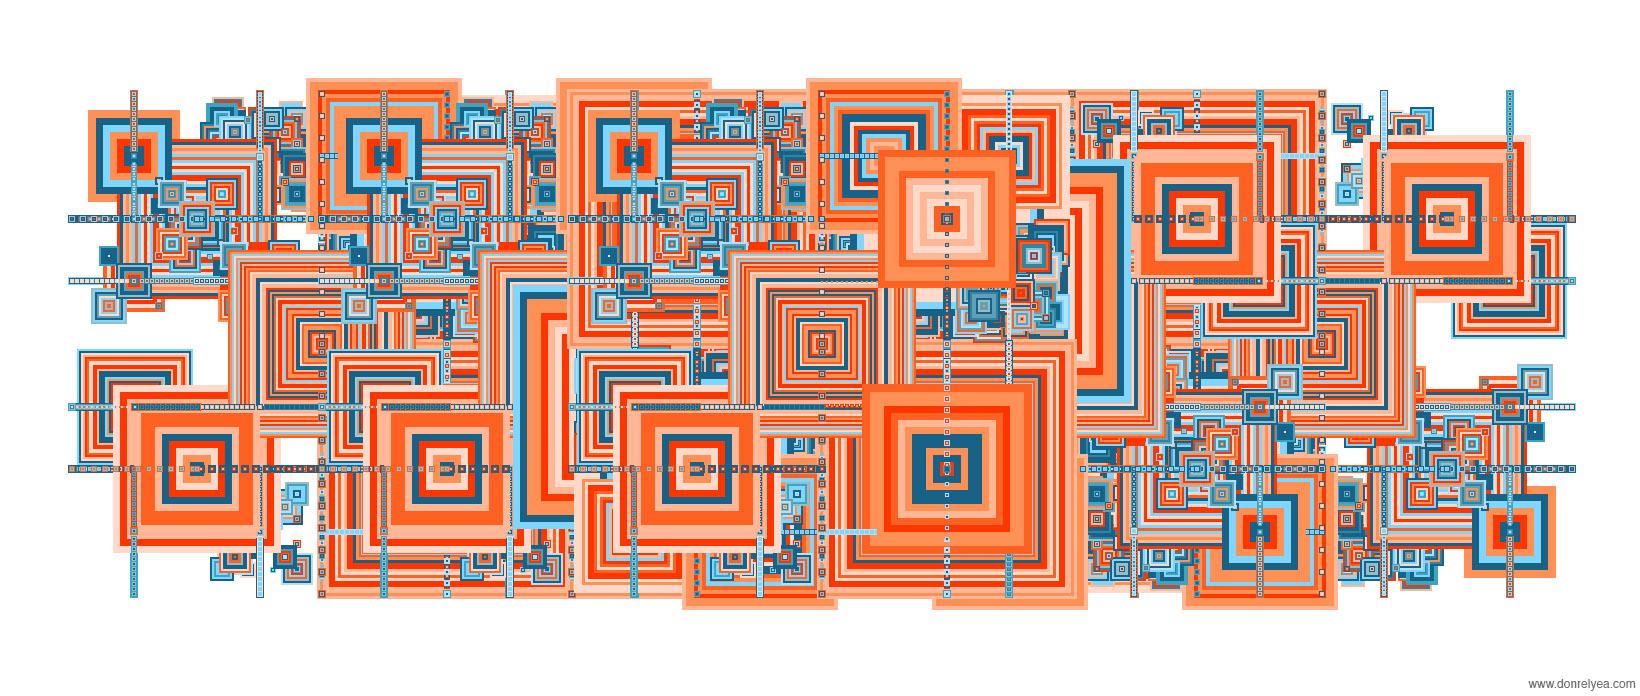 586229_146179869 generative algorithmic artwork By Don Relyea